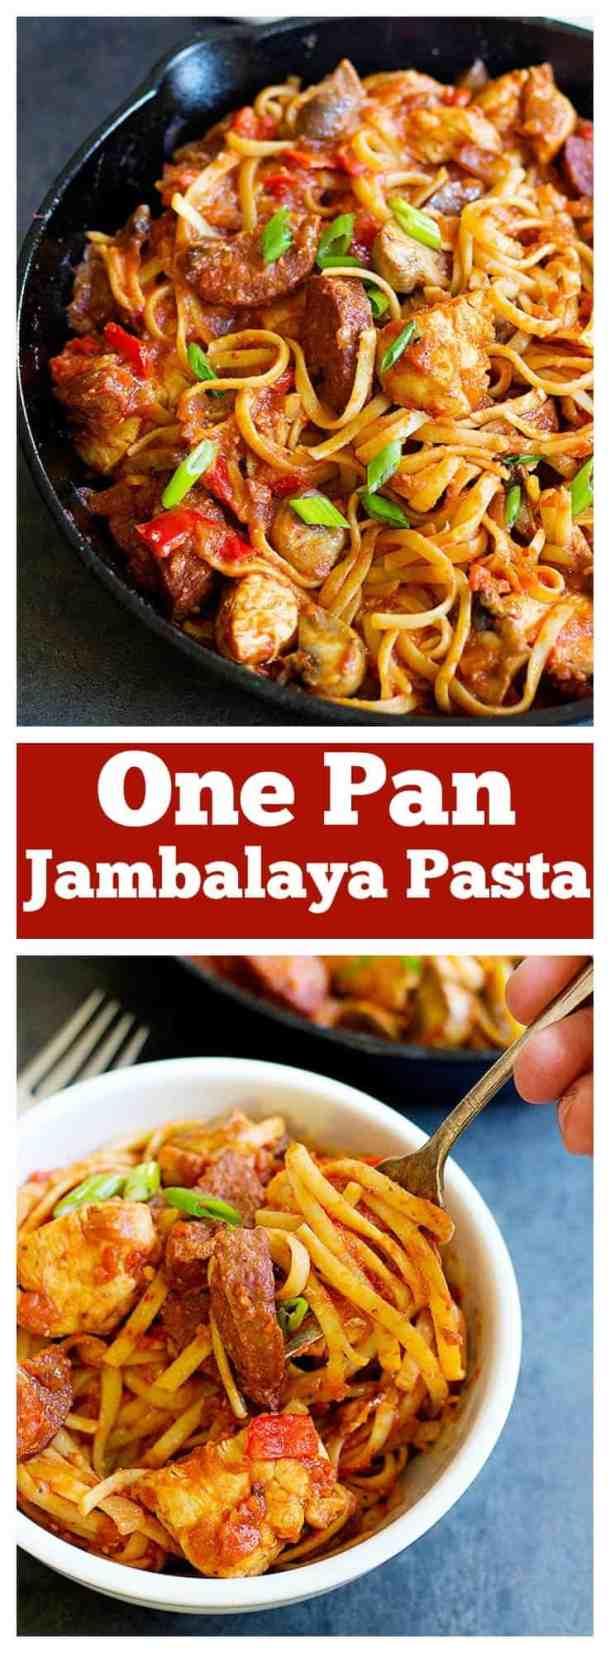 jambalaya pasta   jambalaya pasta recipe   jambalaya pasta Cajun   jambalaya pasta creamy   Cajun Jambalaya Pasta   Cajun Pasta  unicornsinthekitchen.com